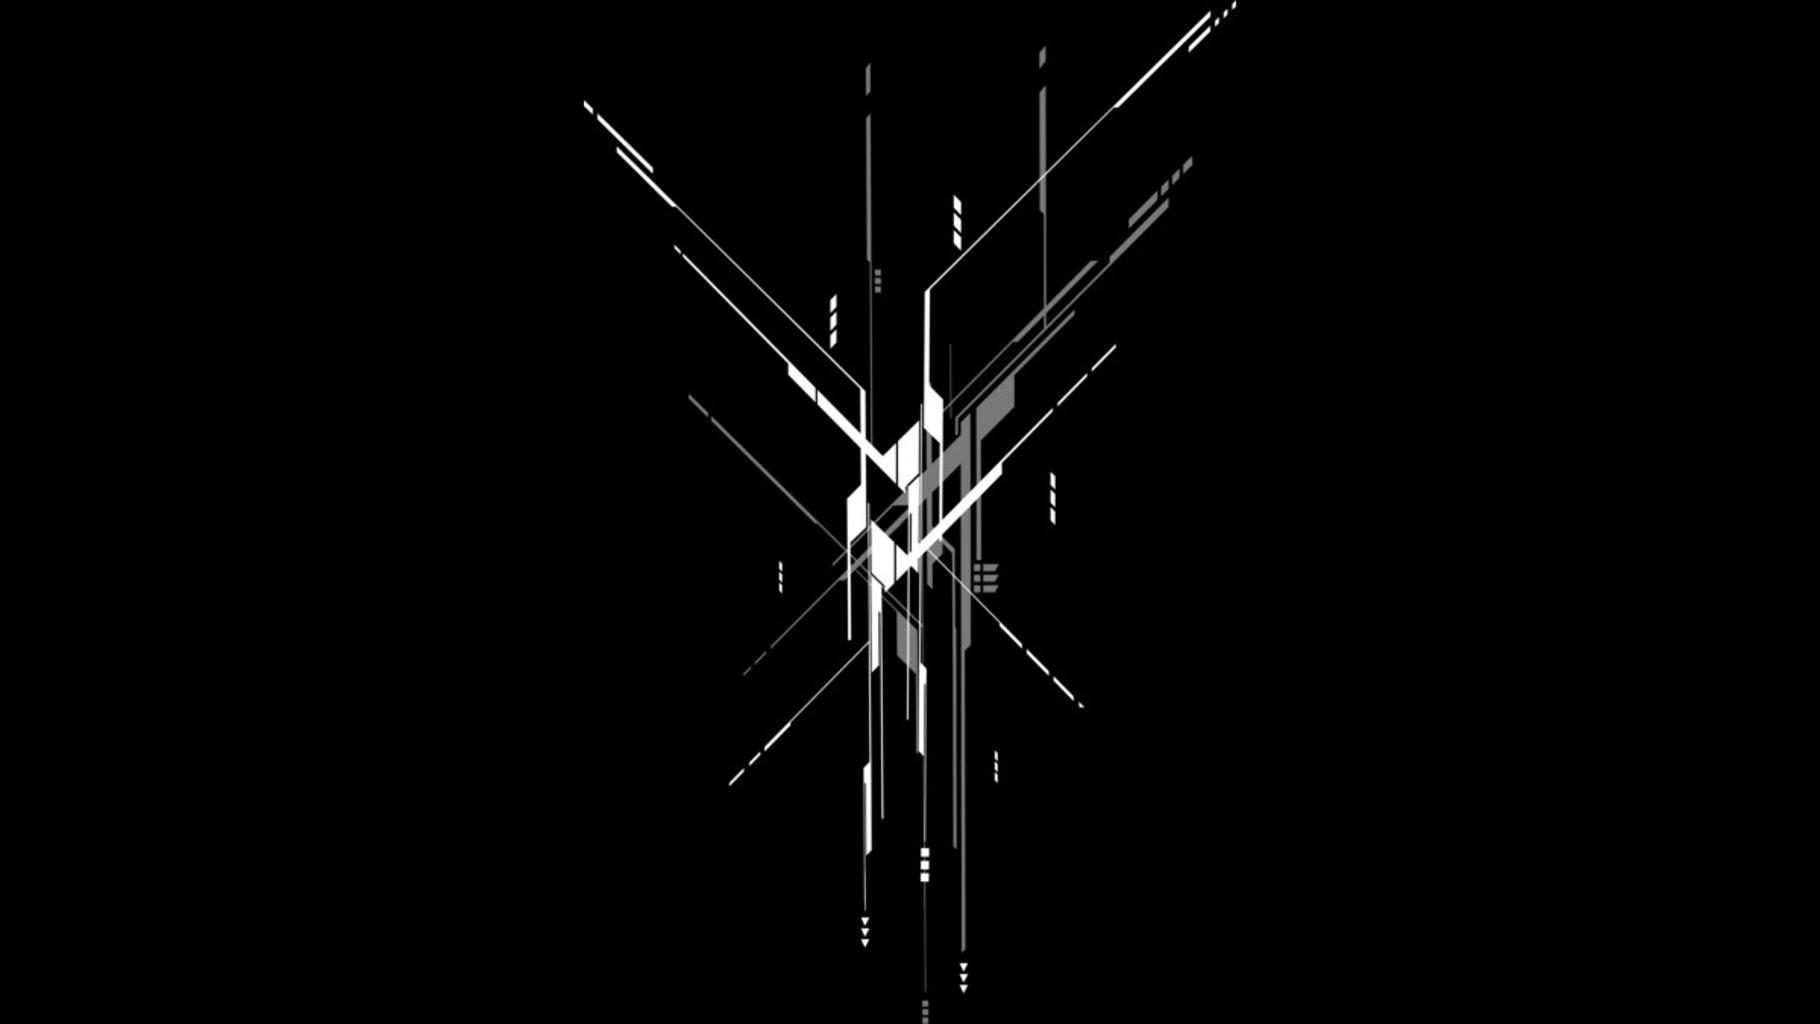 Design by Humans: Midnight Rain